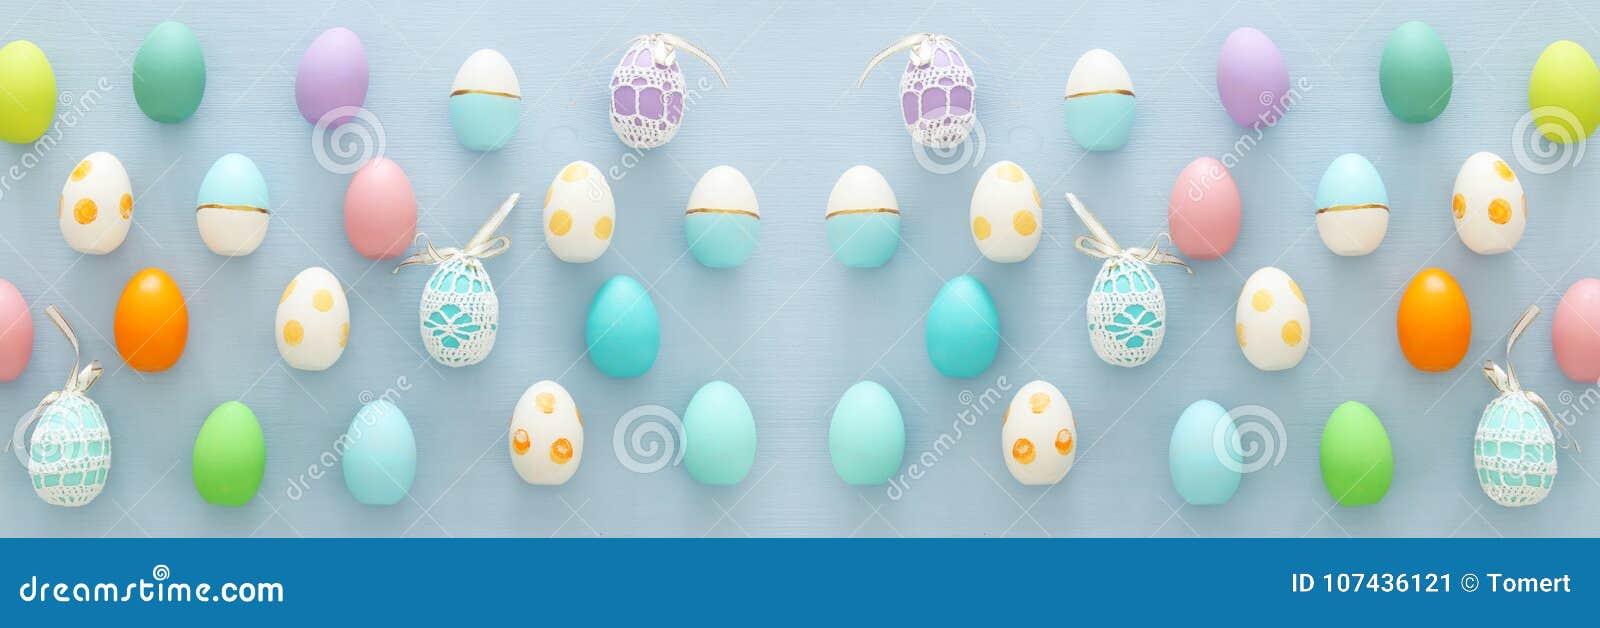 Vista superior de los huevos coloridos de pascua sobre fondo azul